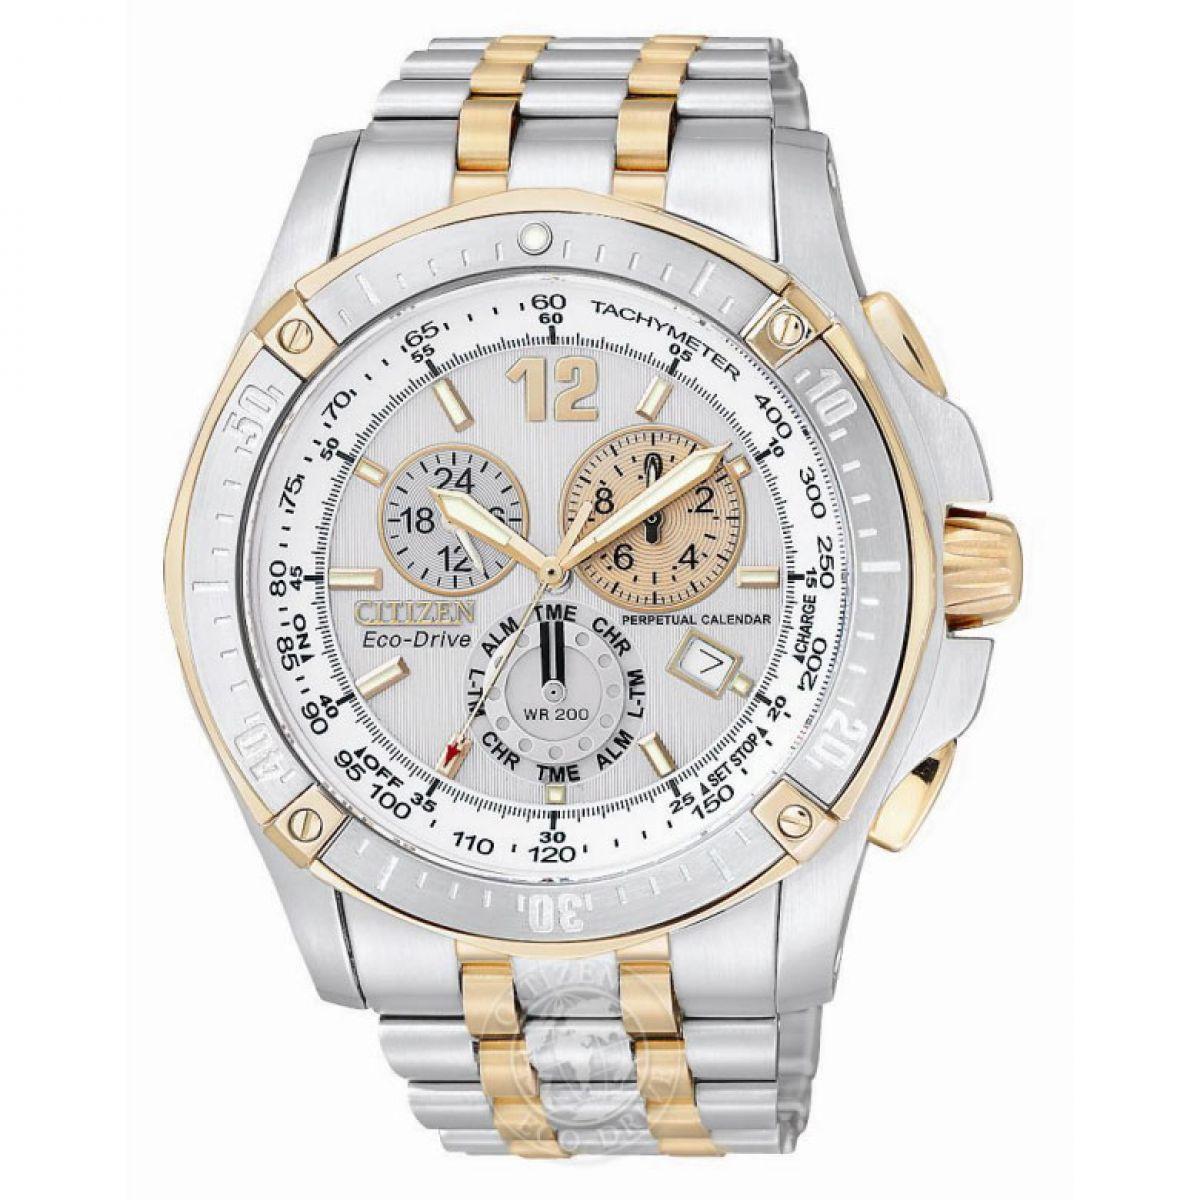 Perpetual Calendar Chronograph : Gents citizen perpetual calendar alarm chronograph watch